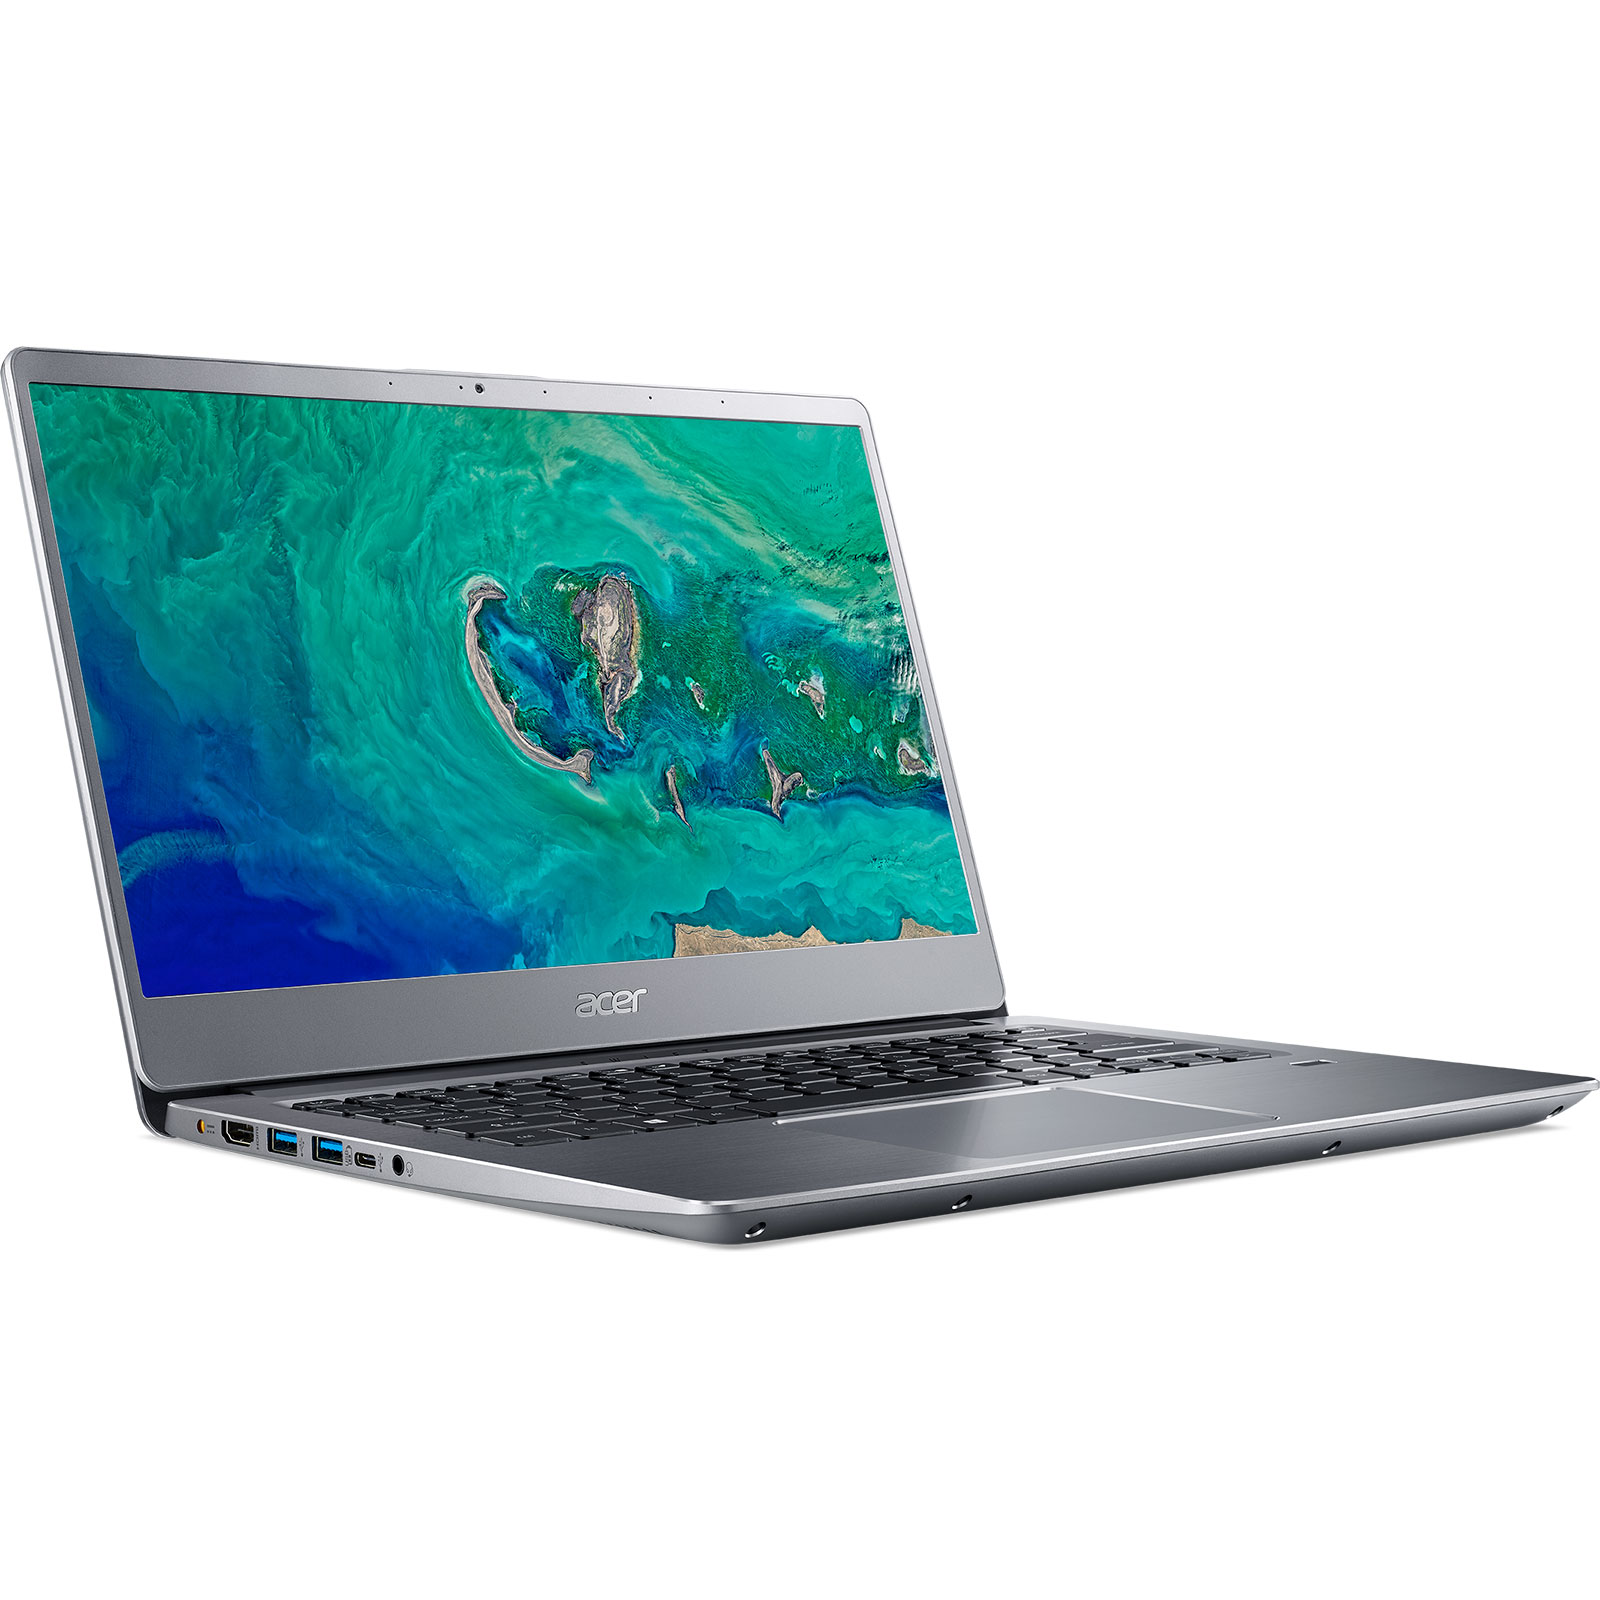 "PC portable Acer Swift 3  SF314-54-38VD Gris Intel Core i3-7020U 4 Go SSD 128 Go 14"" LED Full HD Wi-Fi AC/Bluetooth Webcam Windows 10 Famille 64 bits"